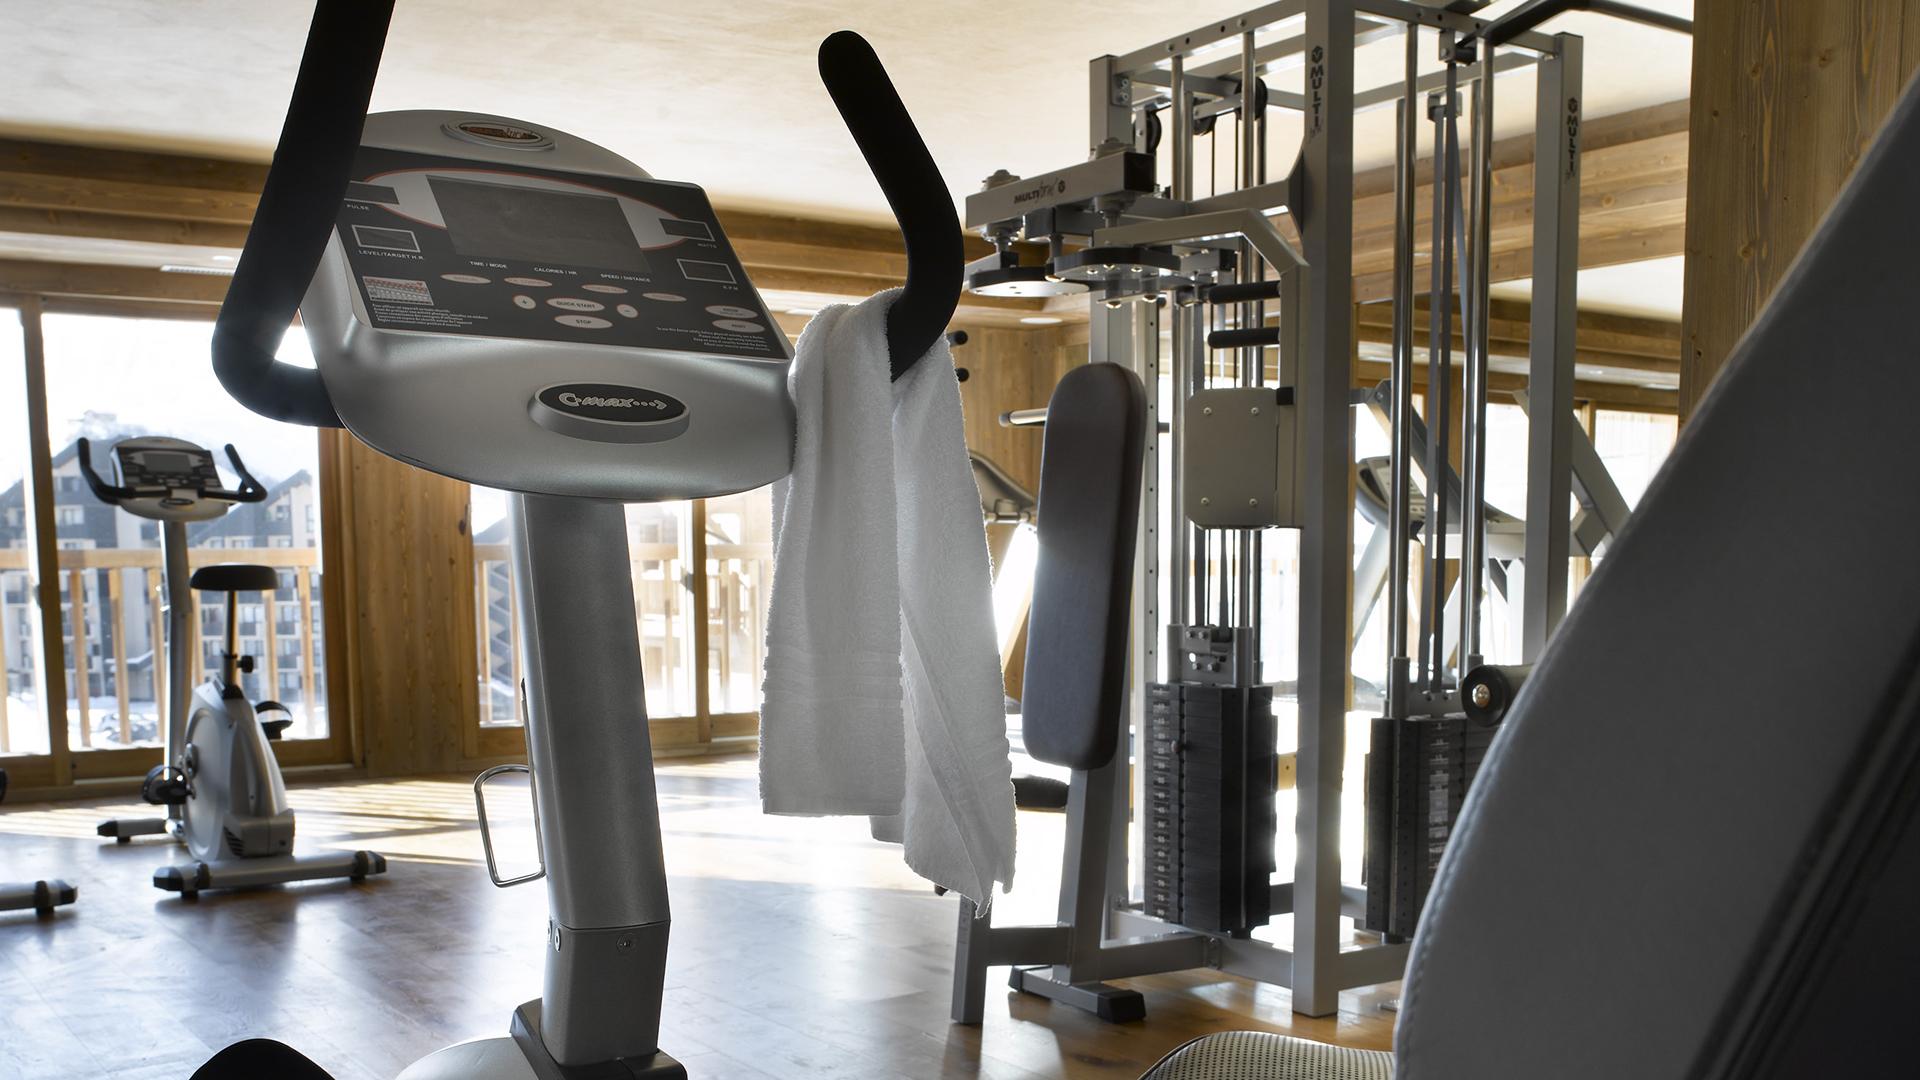 Salle de cardio training, Les Clarines - CGH Résidences